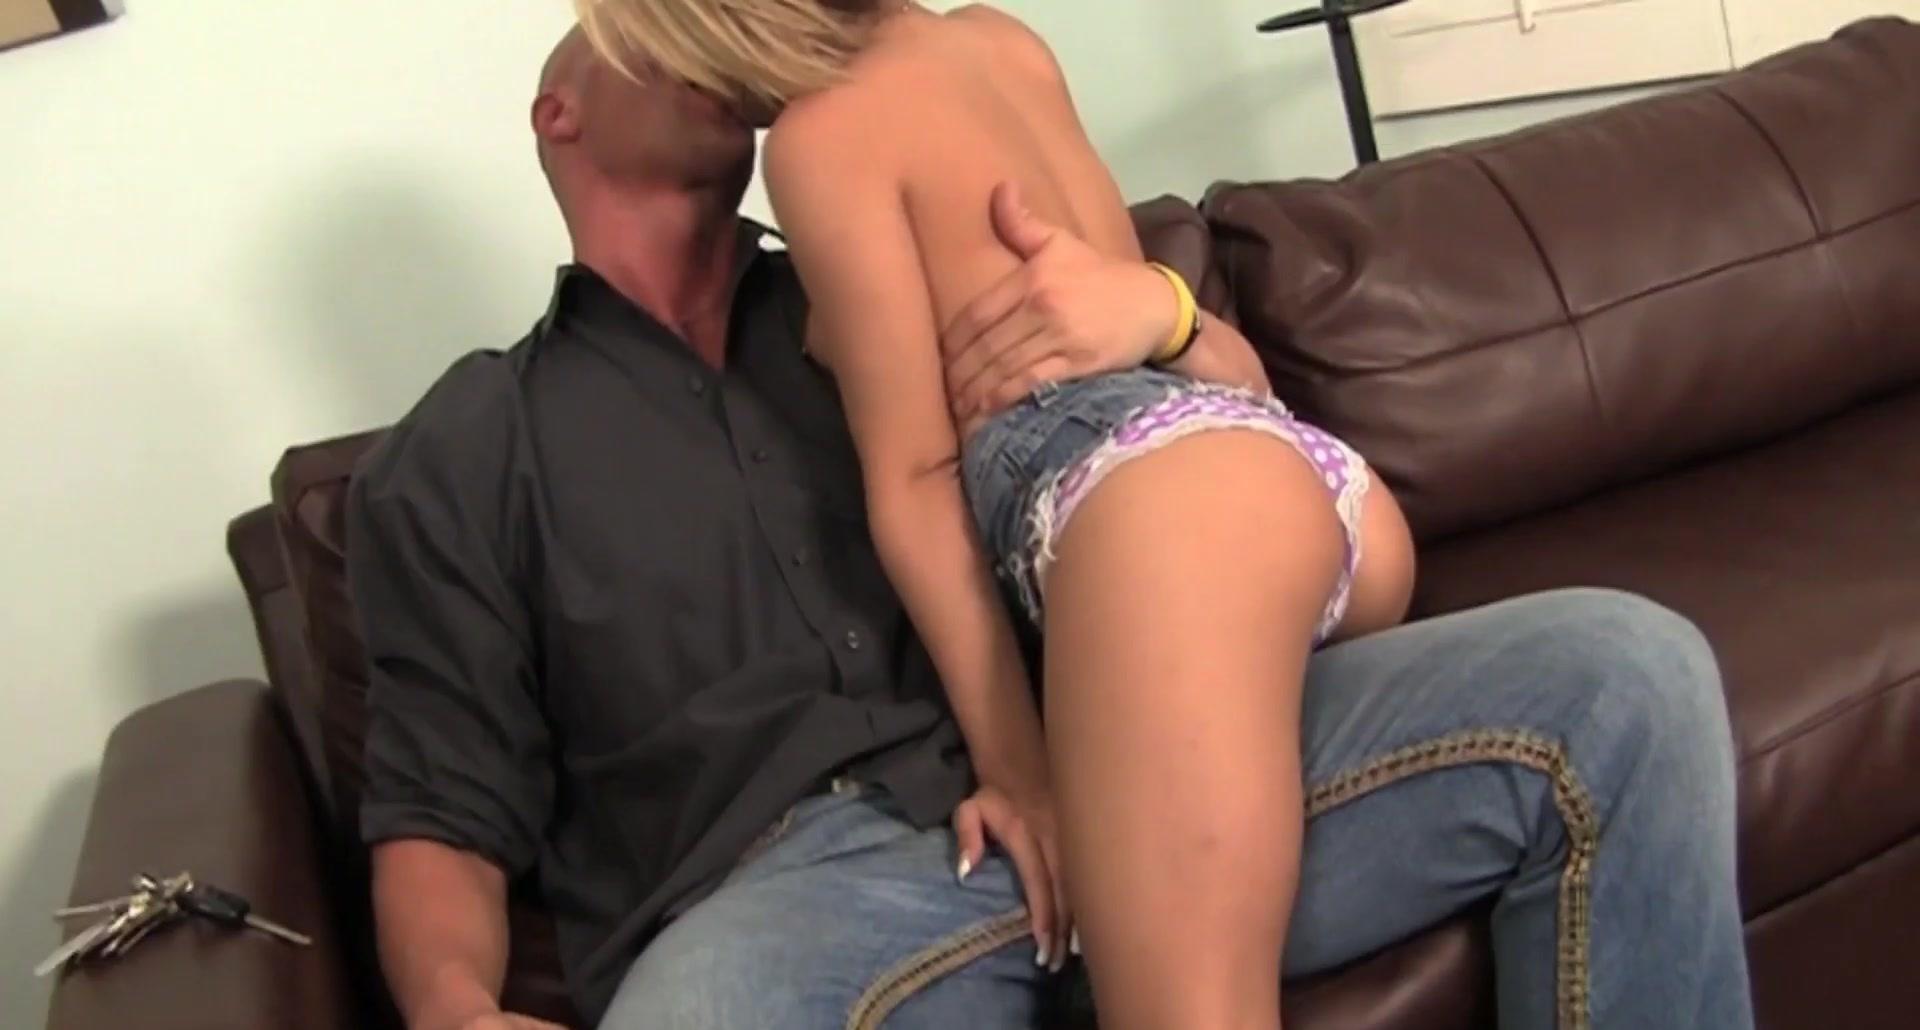 Teen pornstar Caprice Capone fucks her step dad for his car keys